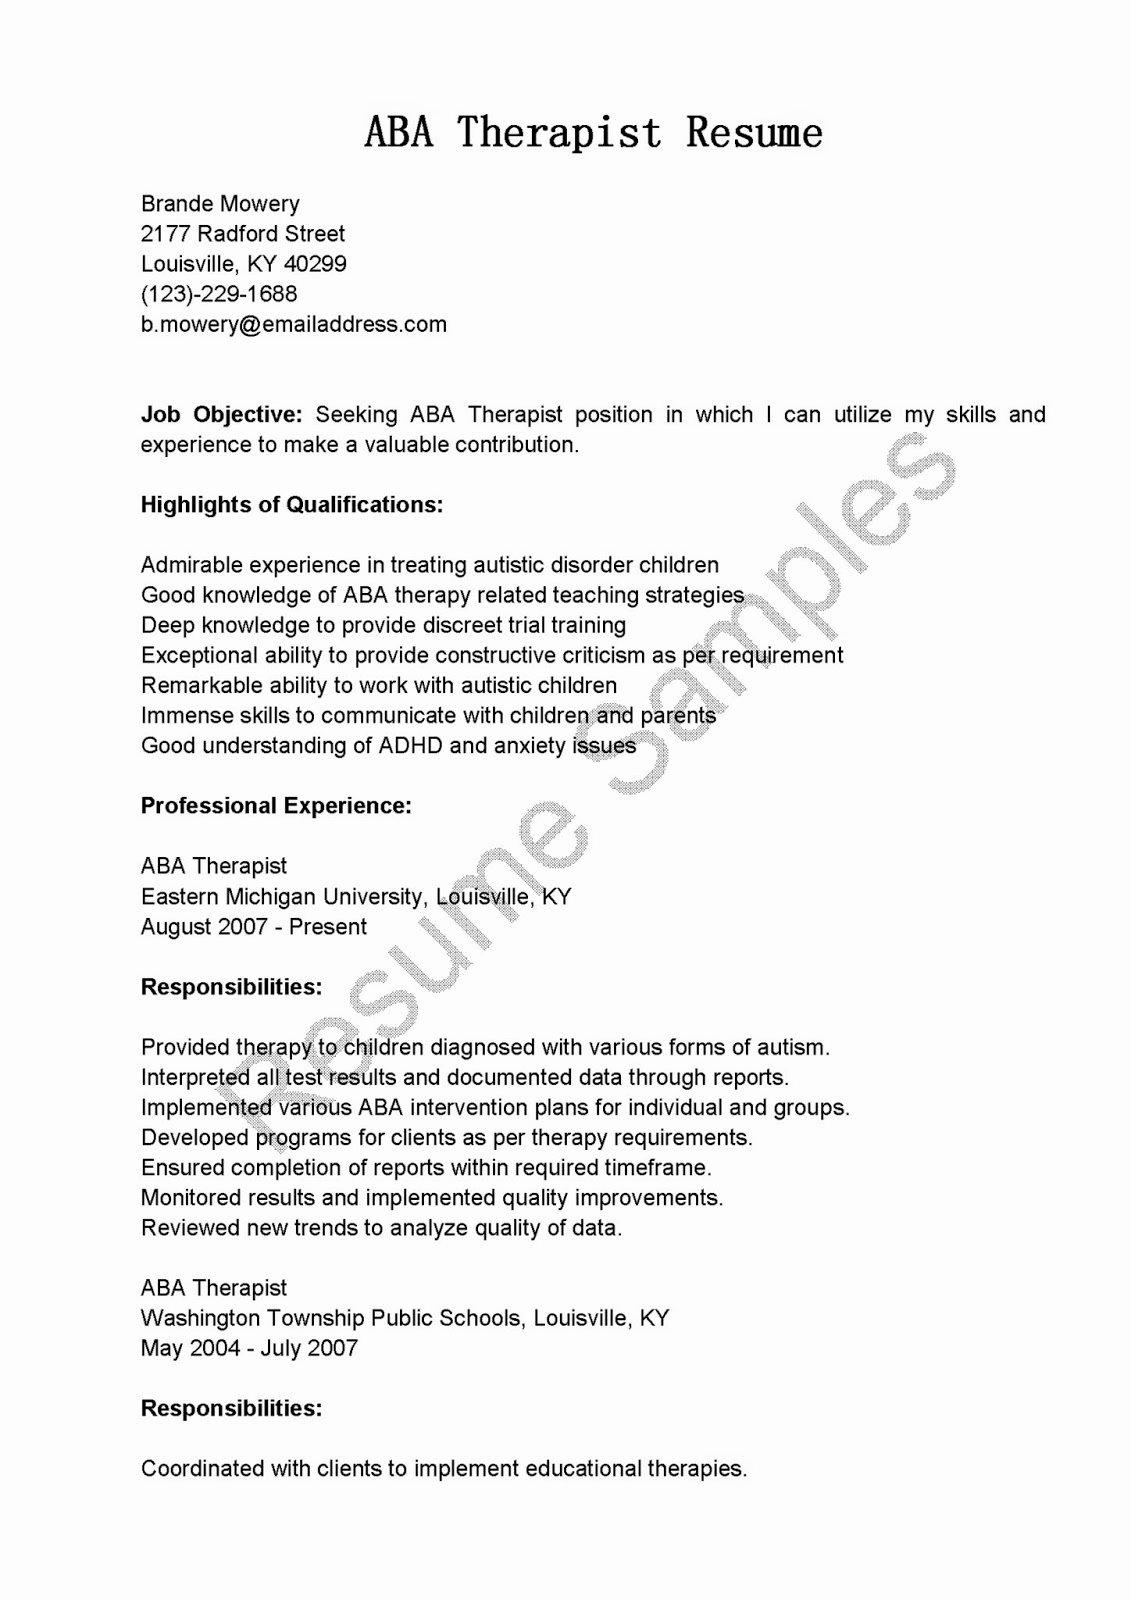 Therapist Marketing Letter Template Fresh Resume Samples Aba therapist Resume Sample